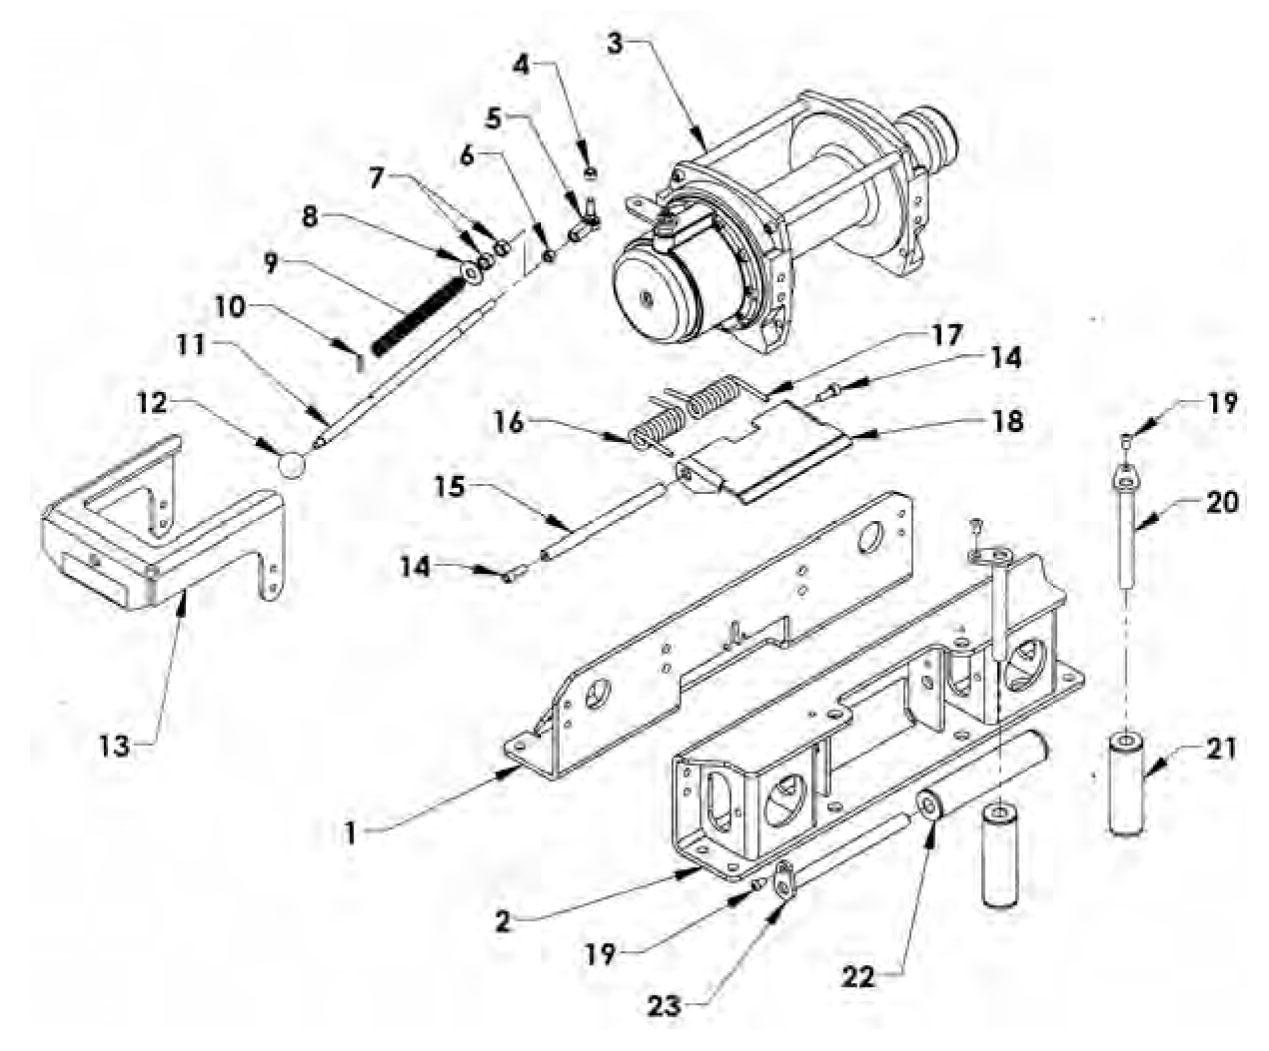 Warn 9000i Winch Parts Diagram Enthusiast Wiring Diagrams M12000 Schematic Xd9000i Elsavadorla 8000 Breakdown